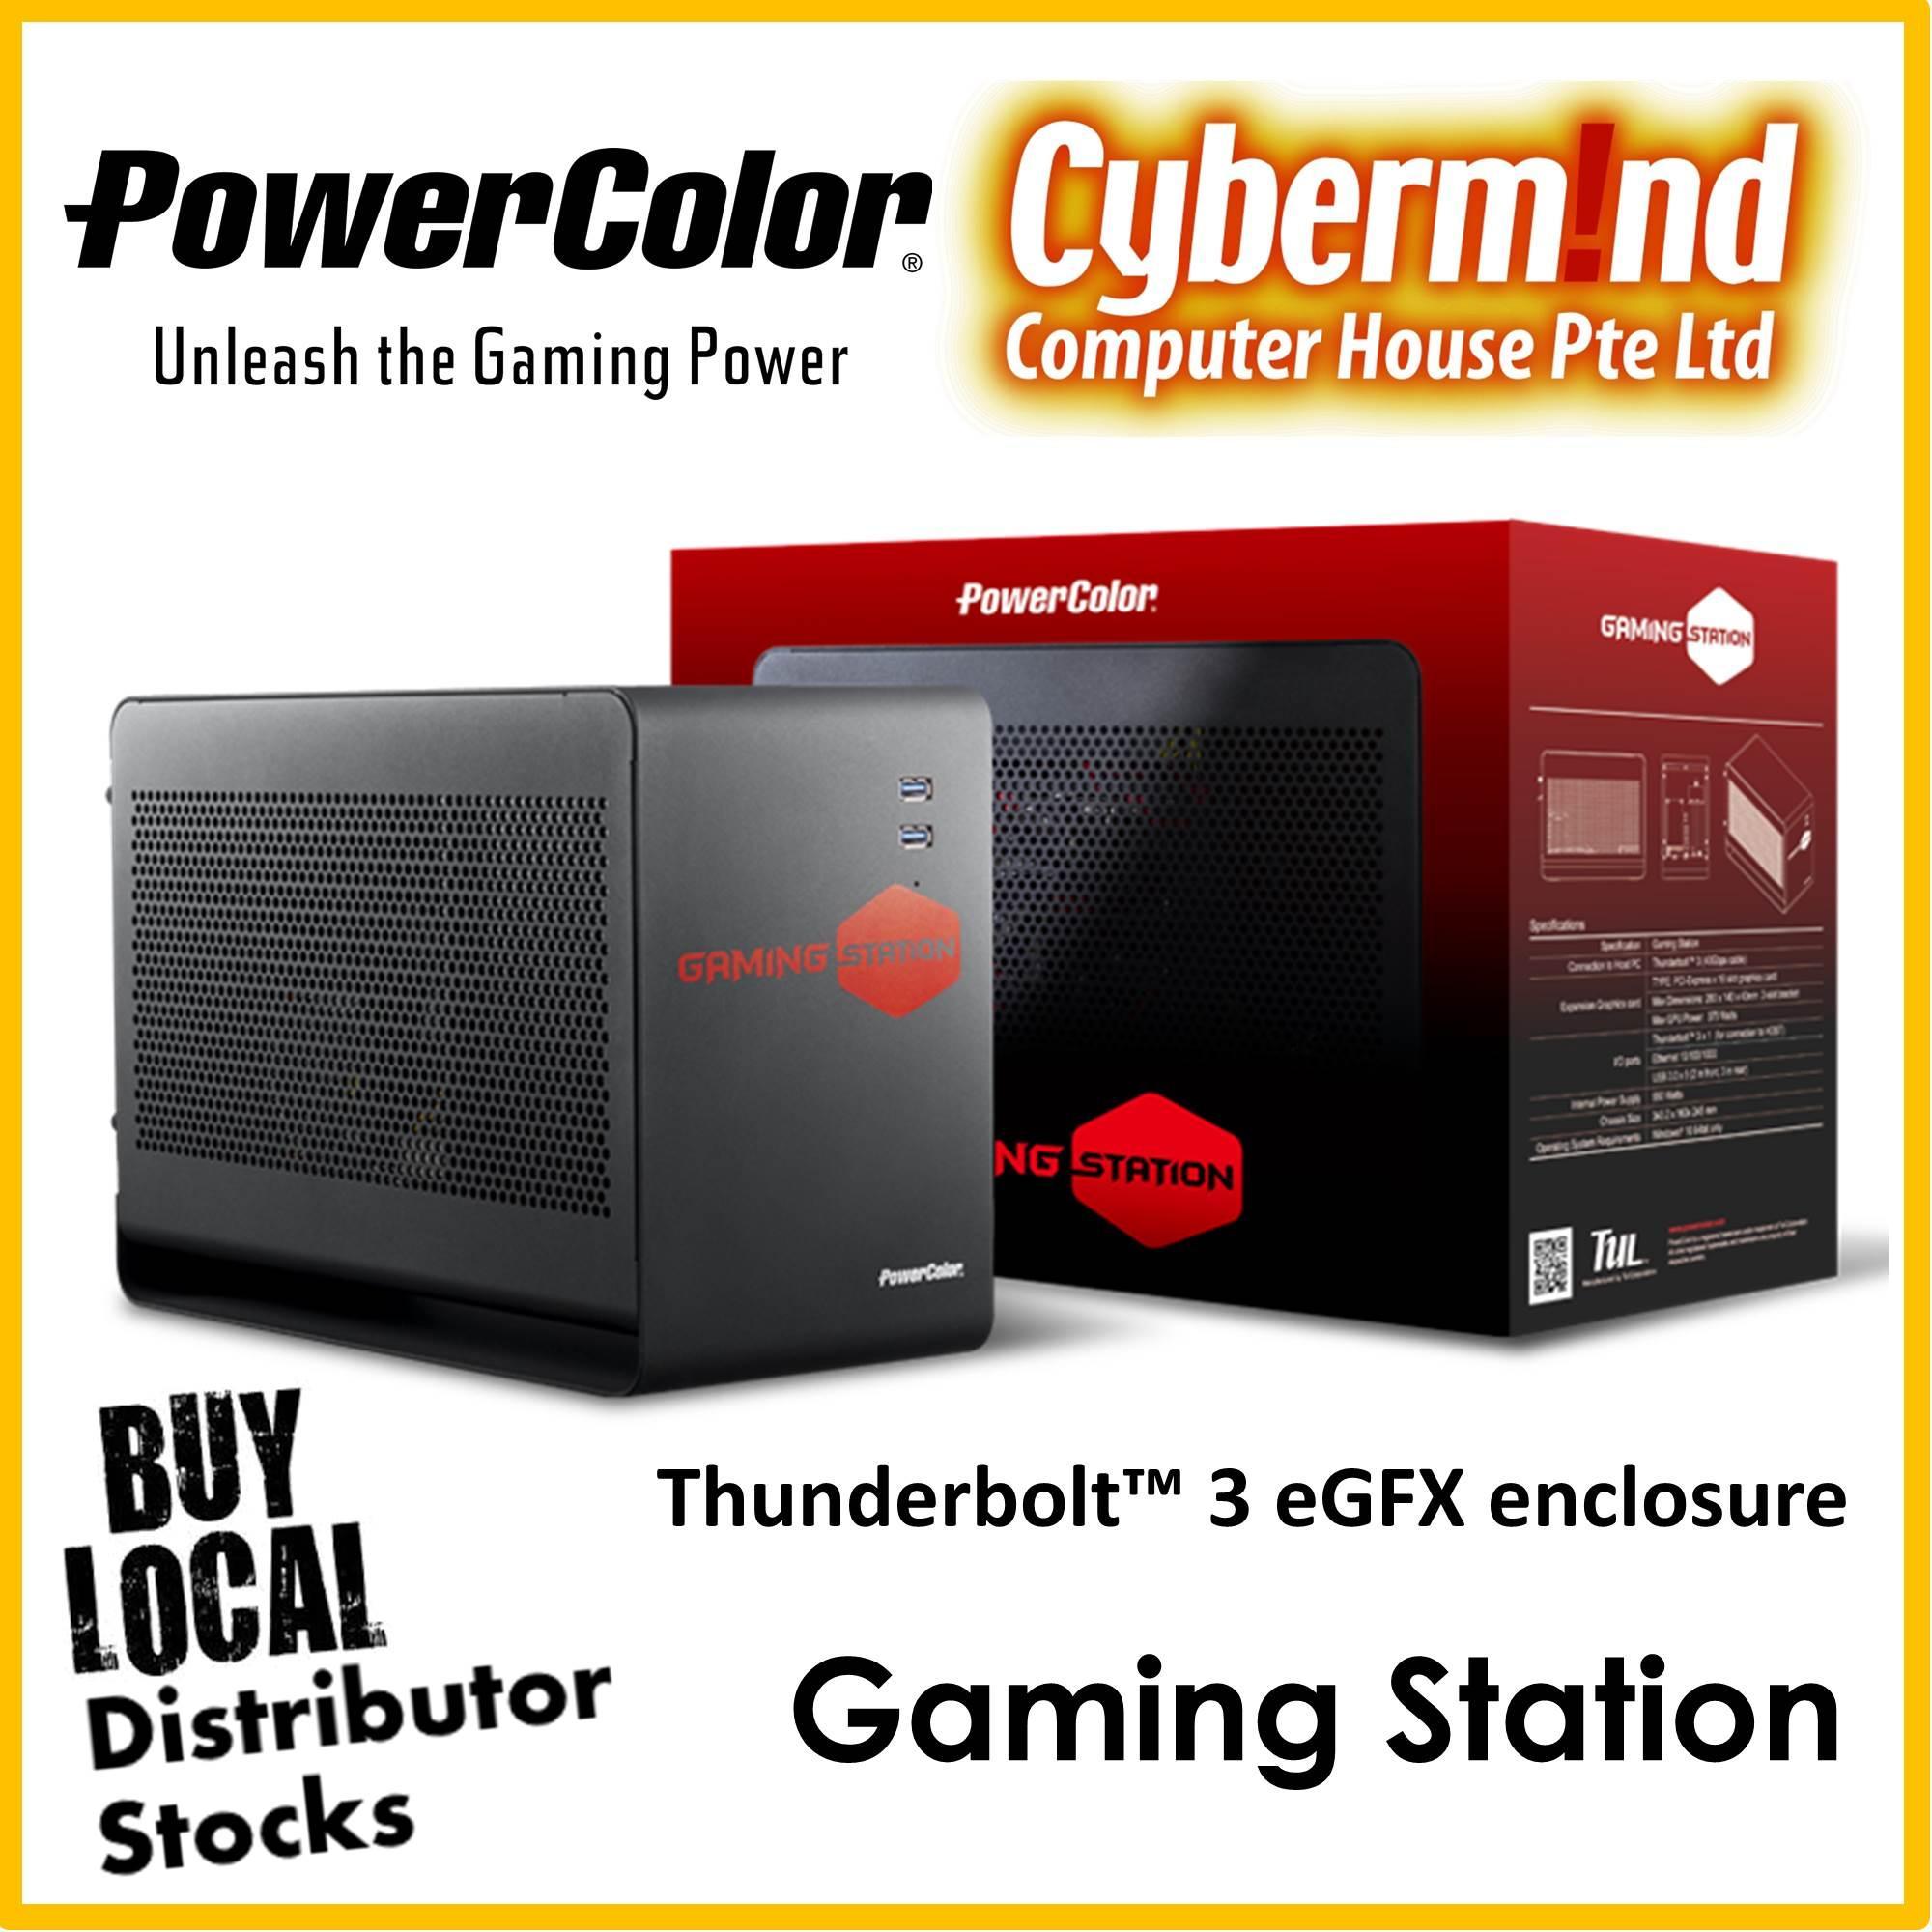 Powercolor Red Dragon Rx570 4gb Gddr5 Singapore Vga Devil Radeon Rx 570 Gaming Station Tb3 External Graphics Enclosure